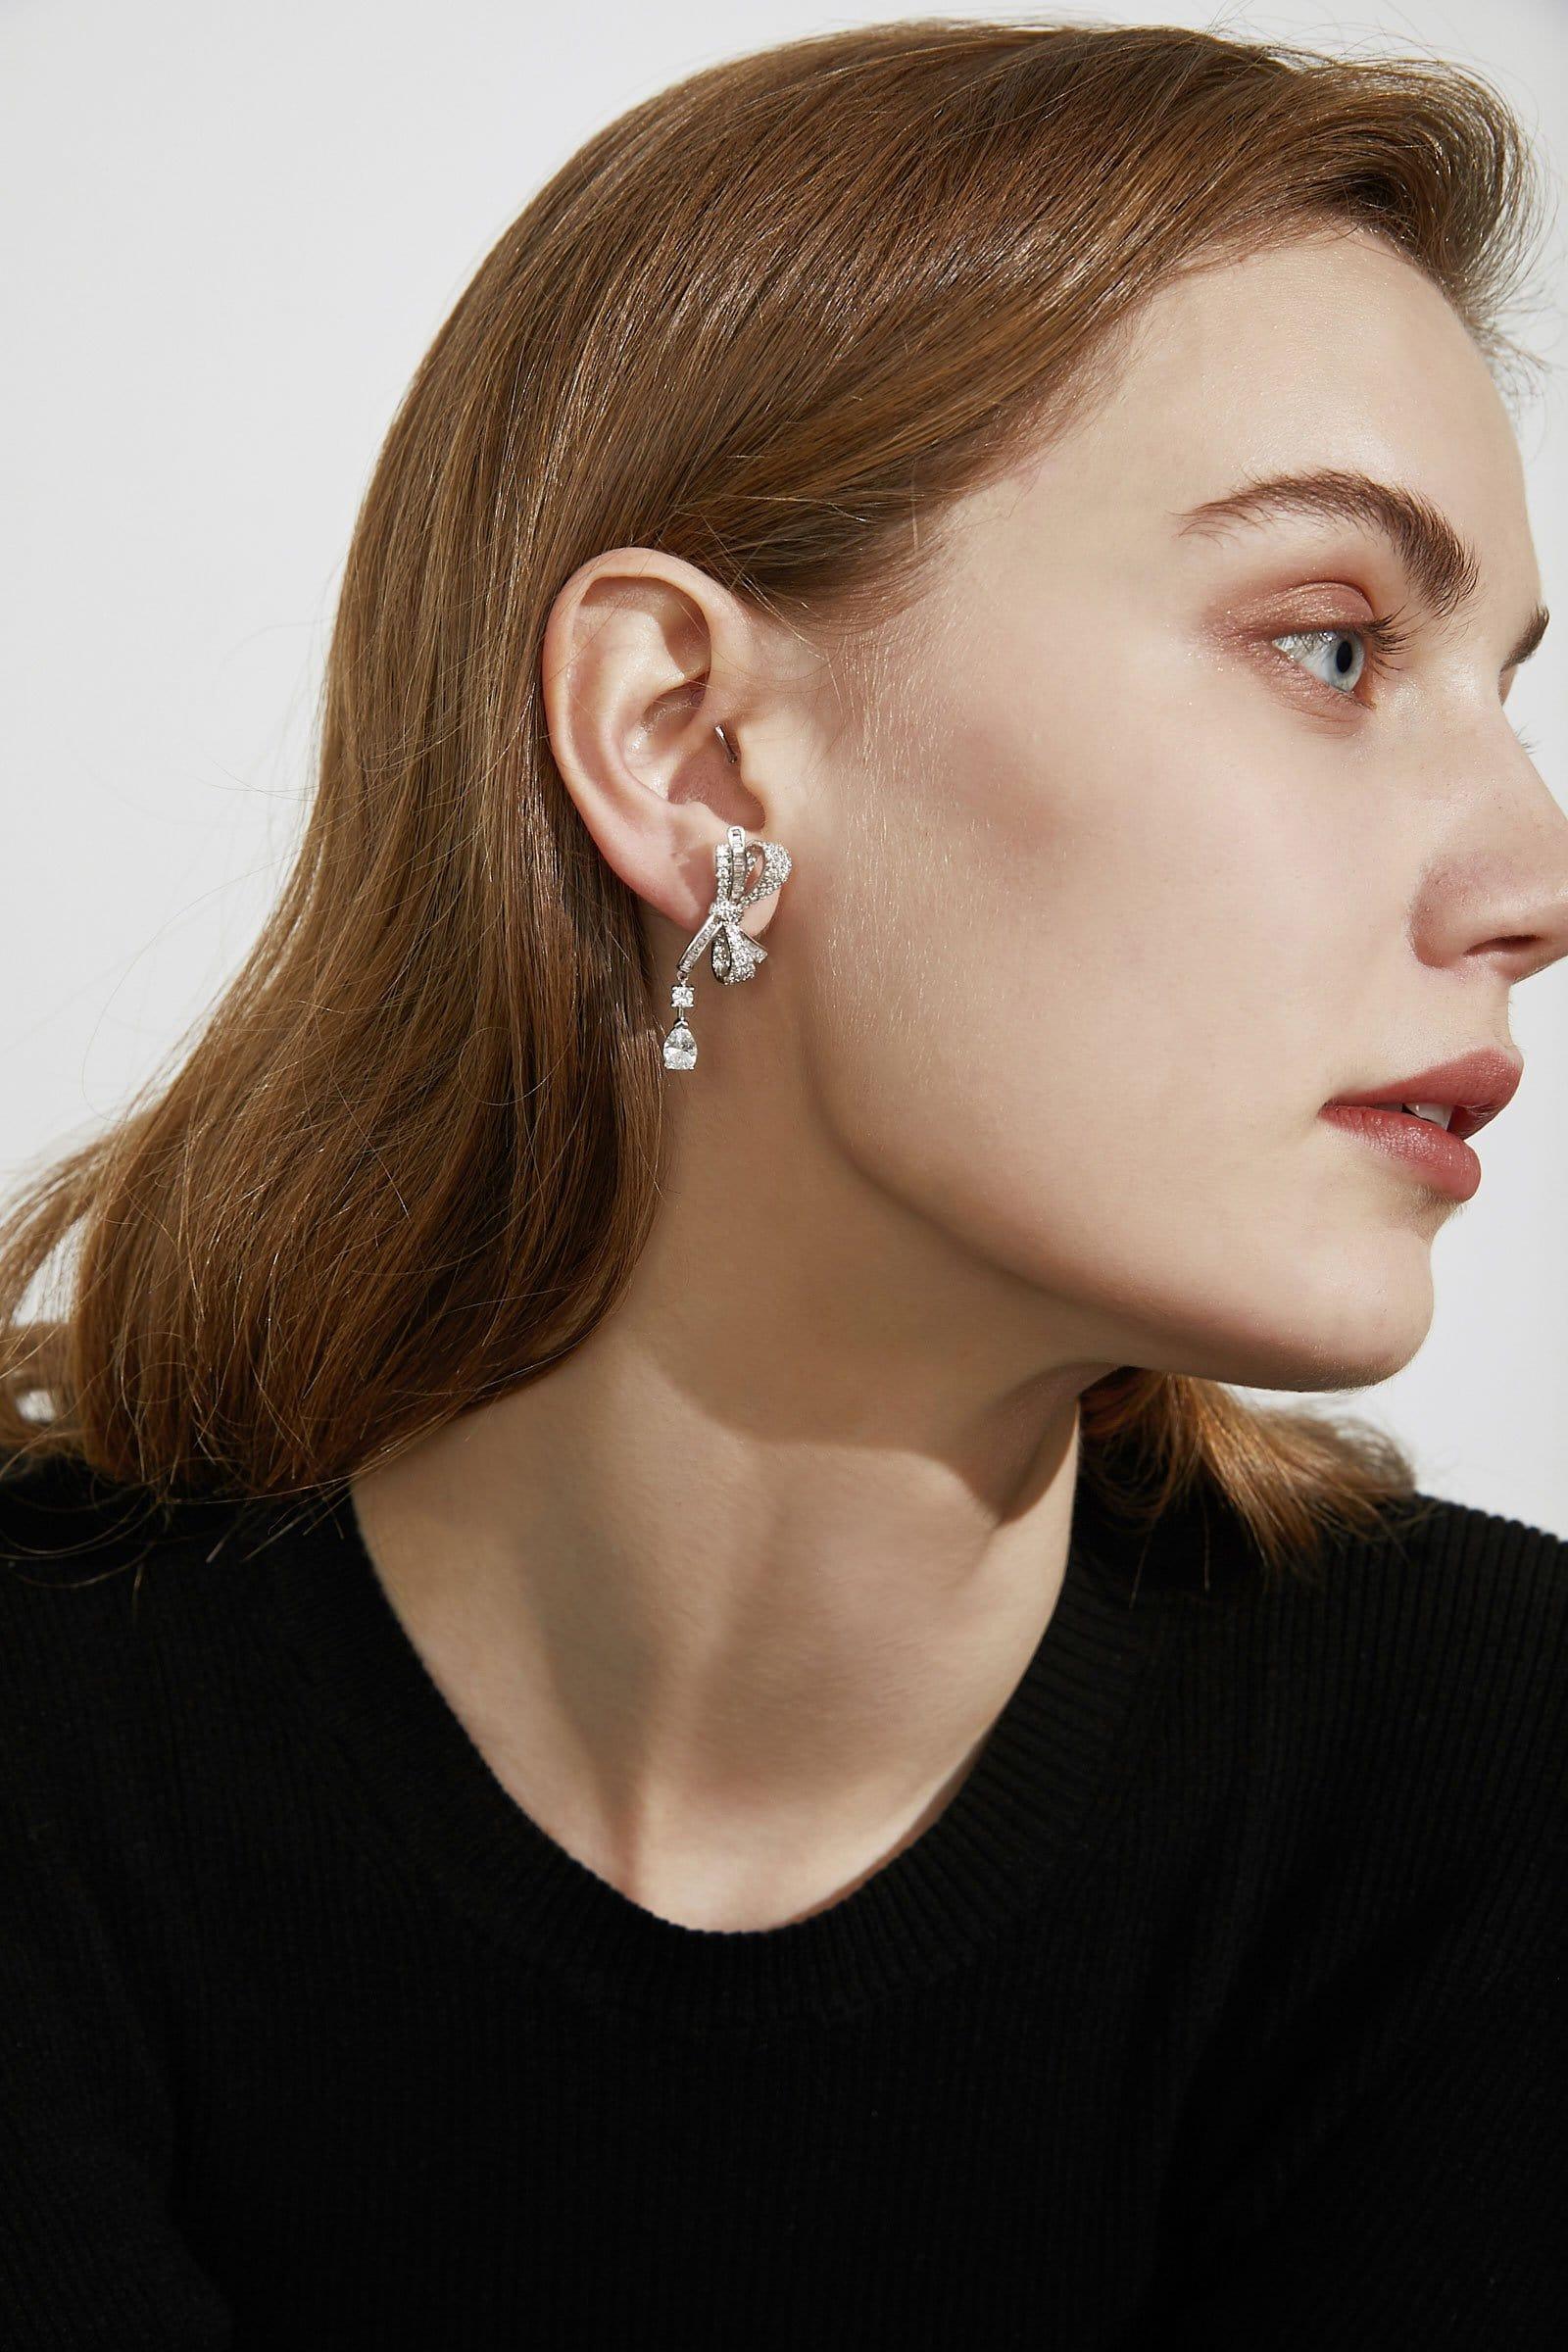 The Gift of Giving Earrings